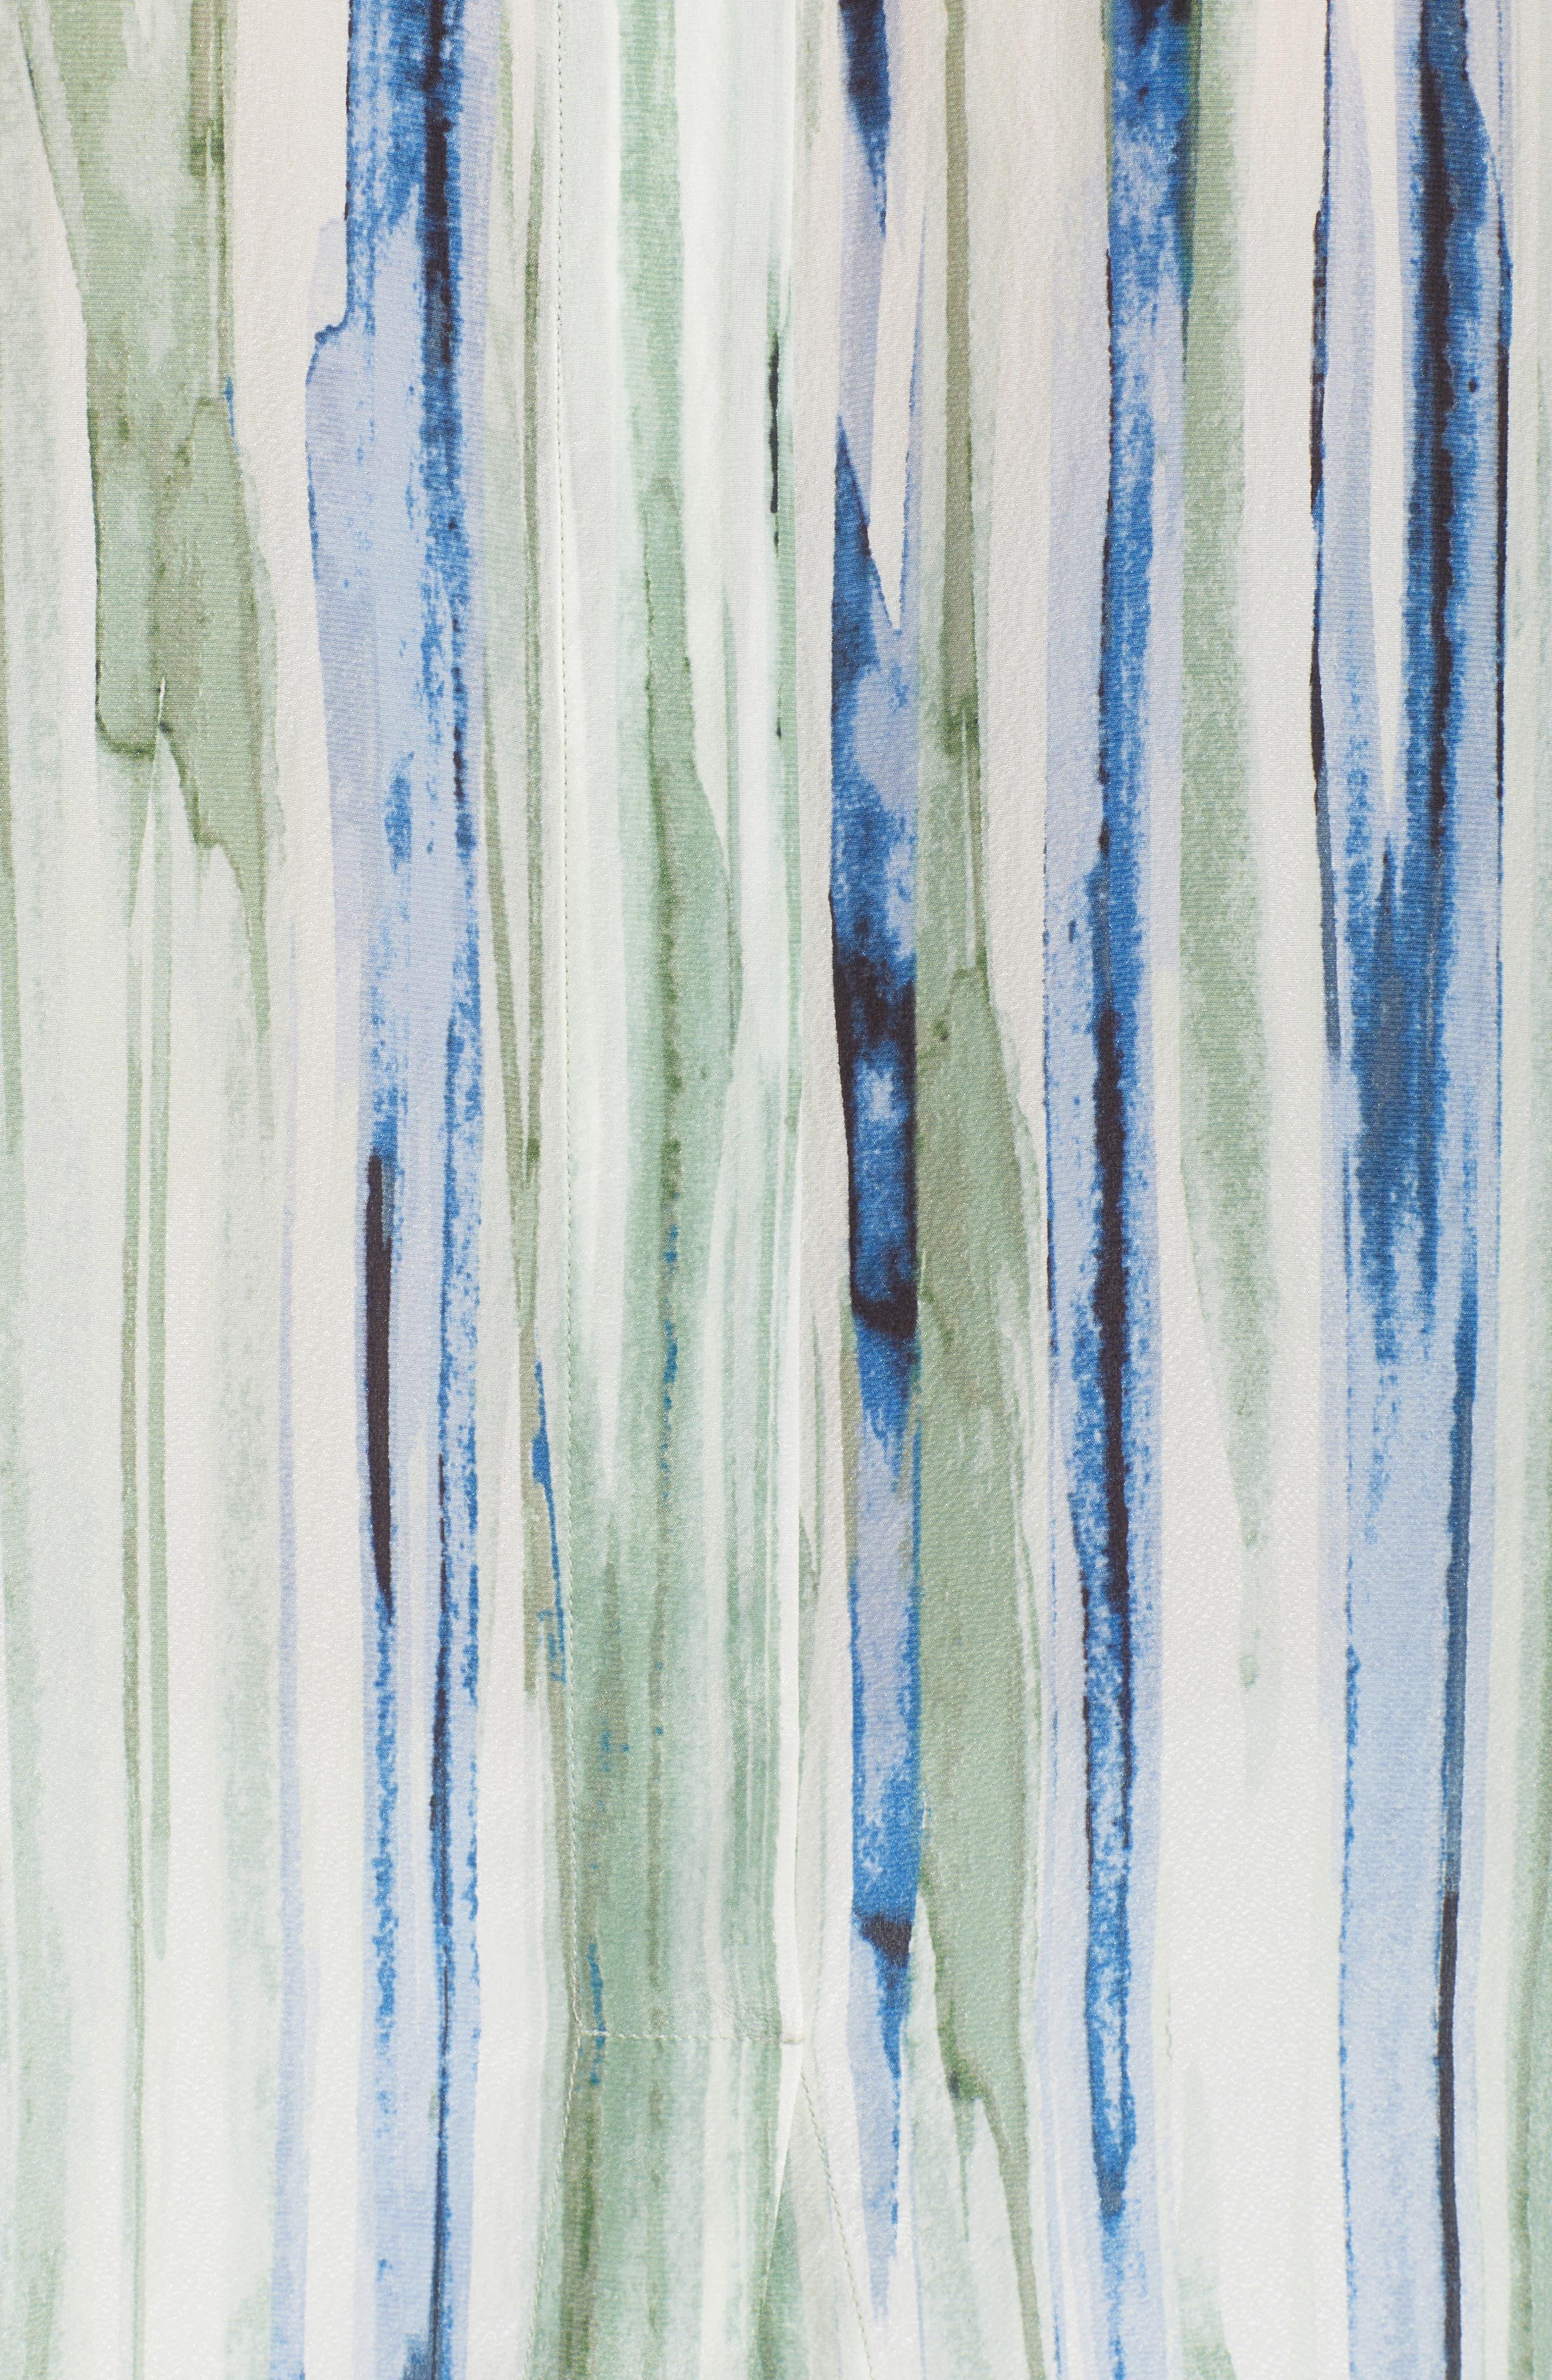 Mojito Nights Silk Blend Top,                             Alternate thumbnail 6, color,                             Multi